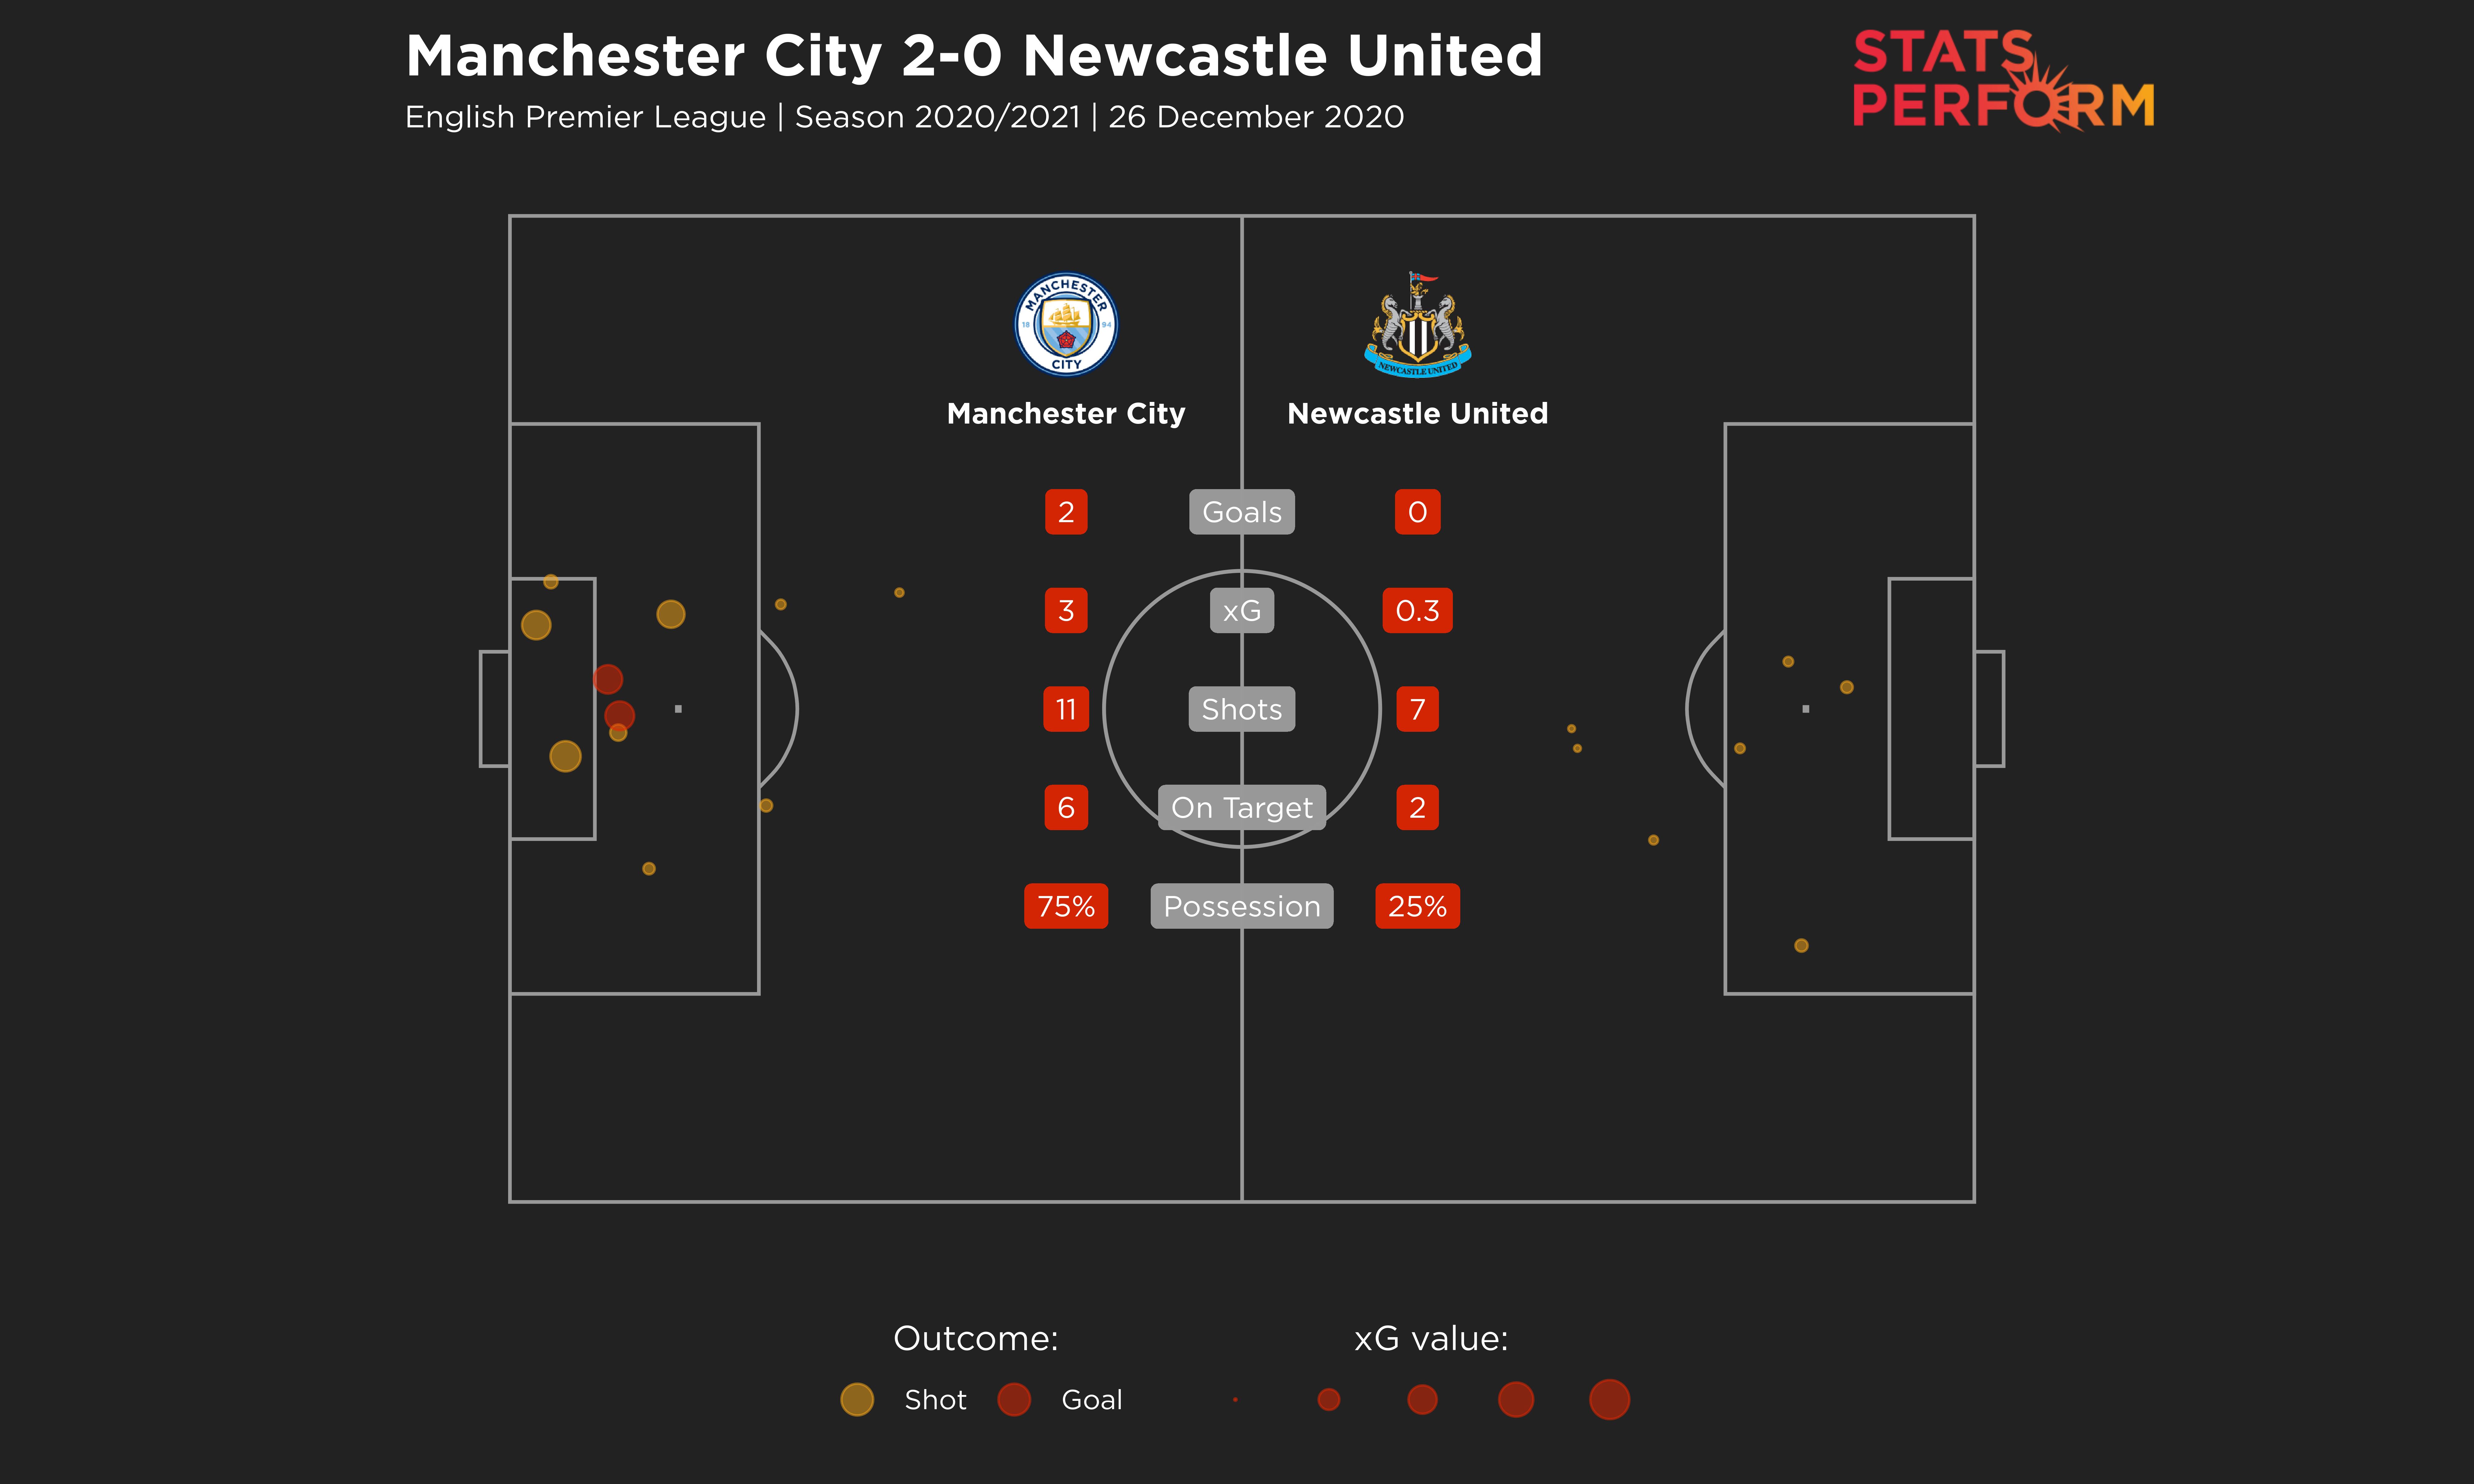 Man City 2-0 Newcastle United